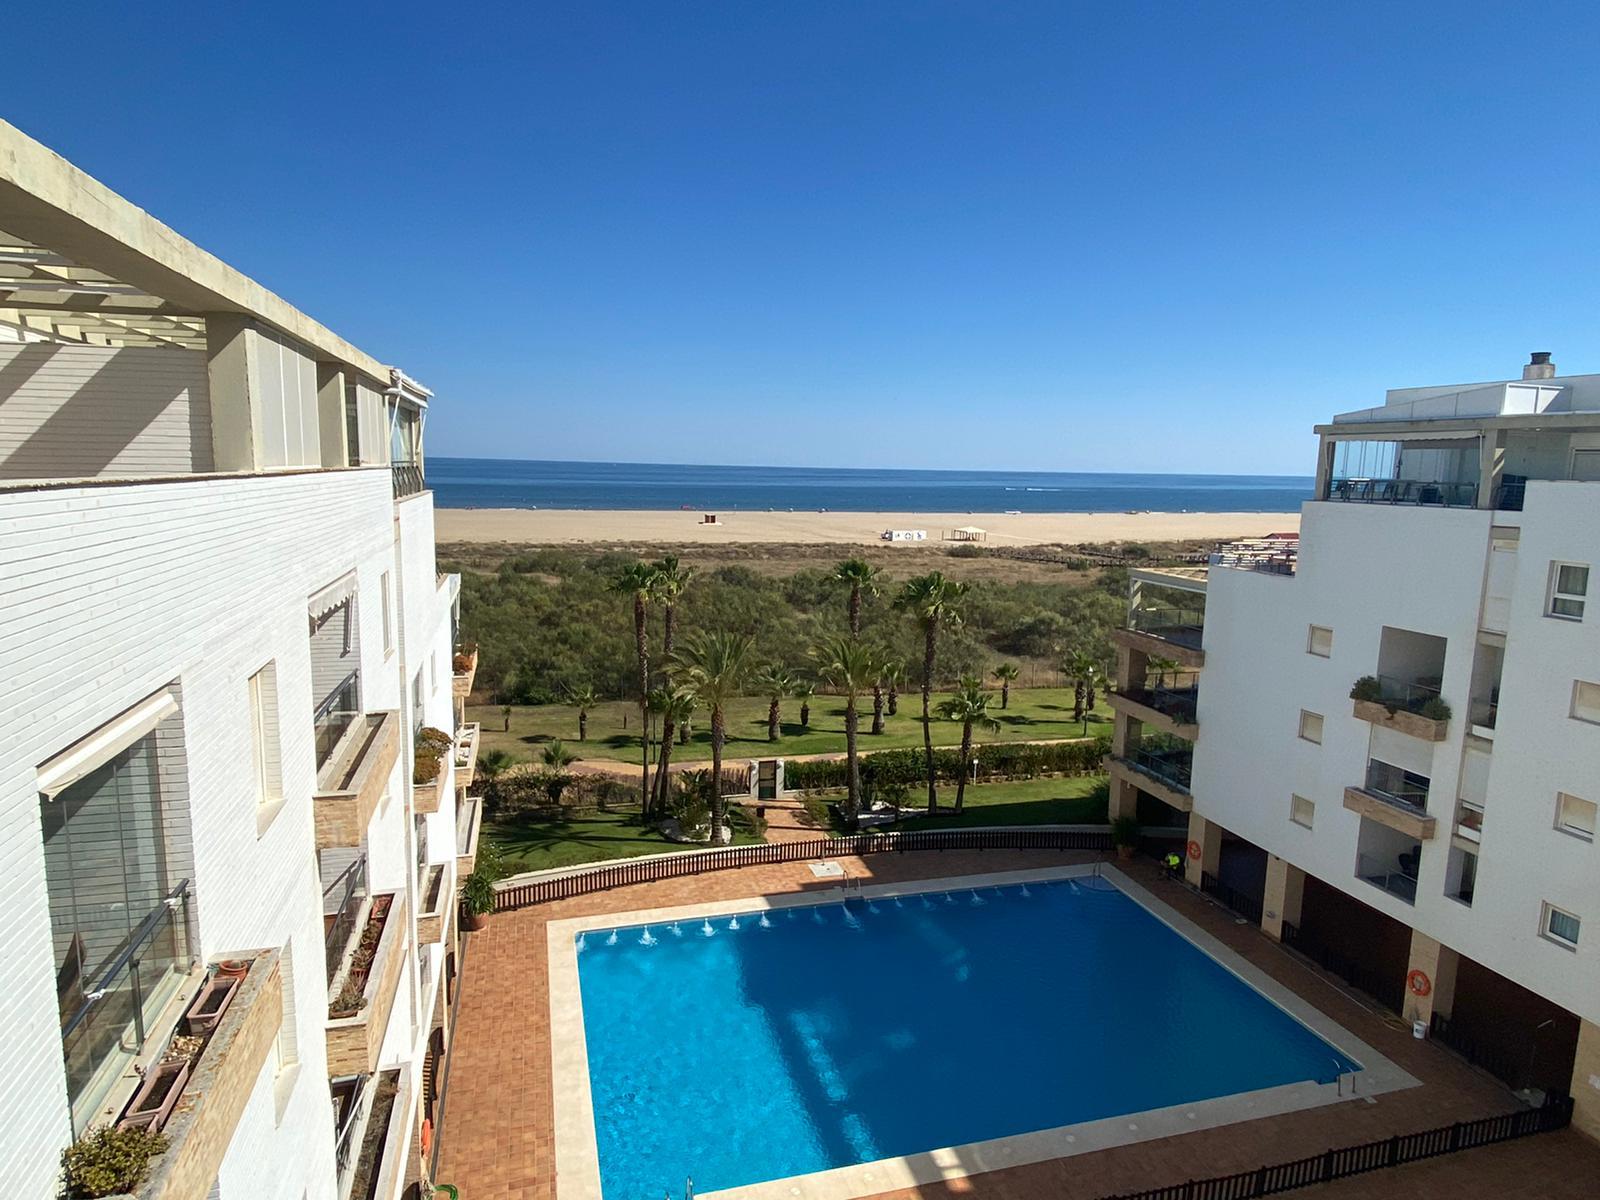 Imagen 29 del Apartamento en El Espigón, 1ª Planta nº4 Poniente (3d+2b), Punta del Moral (HUELVA), Paseo de la Cruz nº22